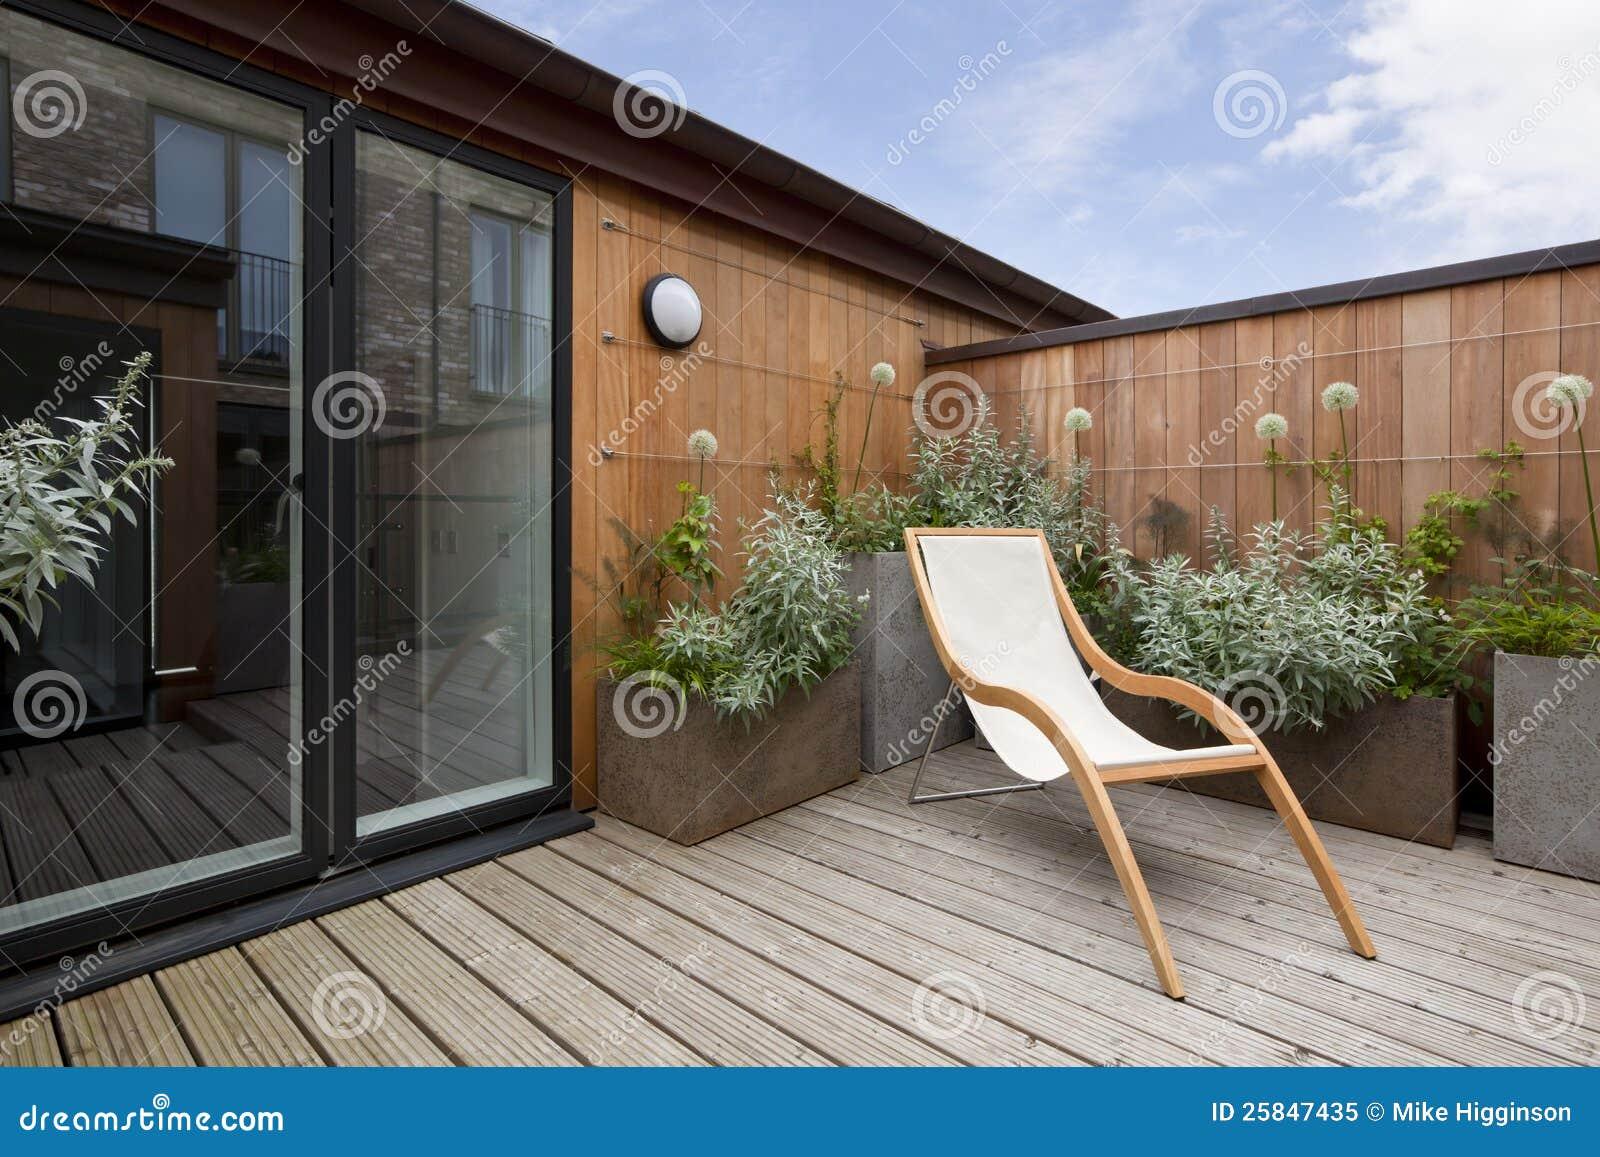 Urban balcony garden stock image Image of